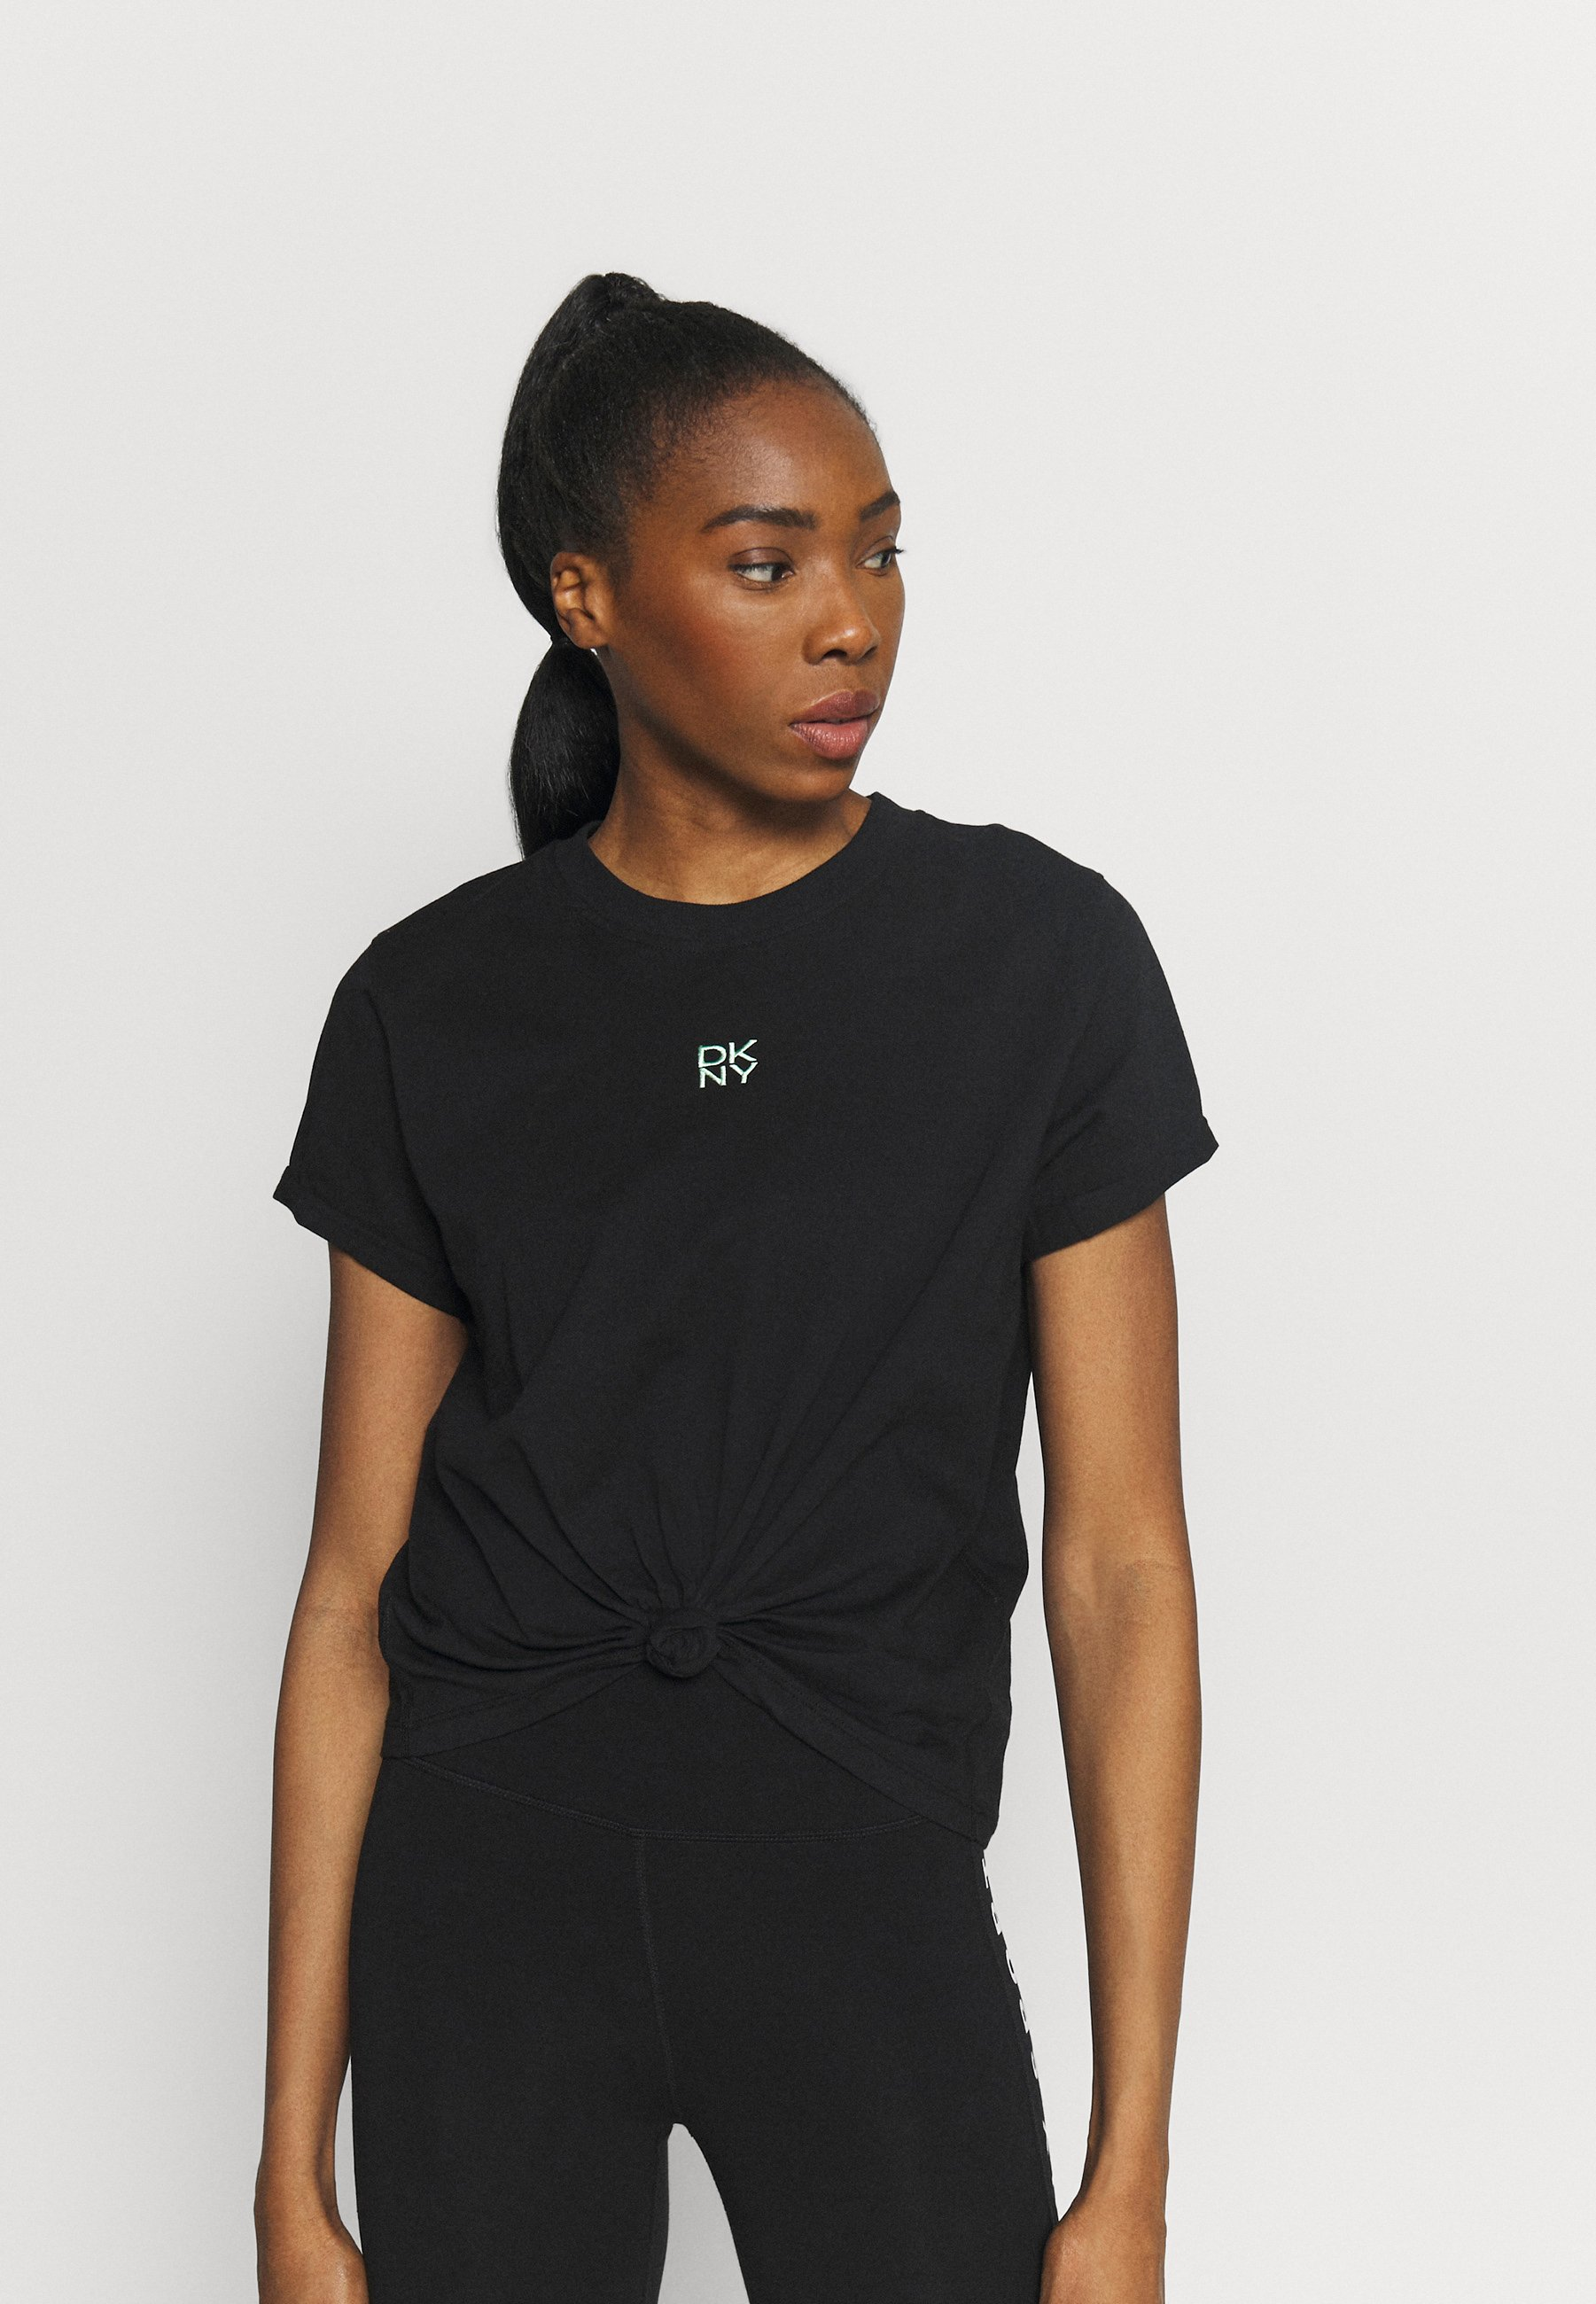 Women STACKED REPEAT LOGO BOXY KNOT TEE - Print T-shirt